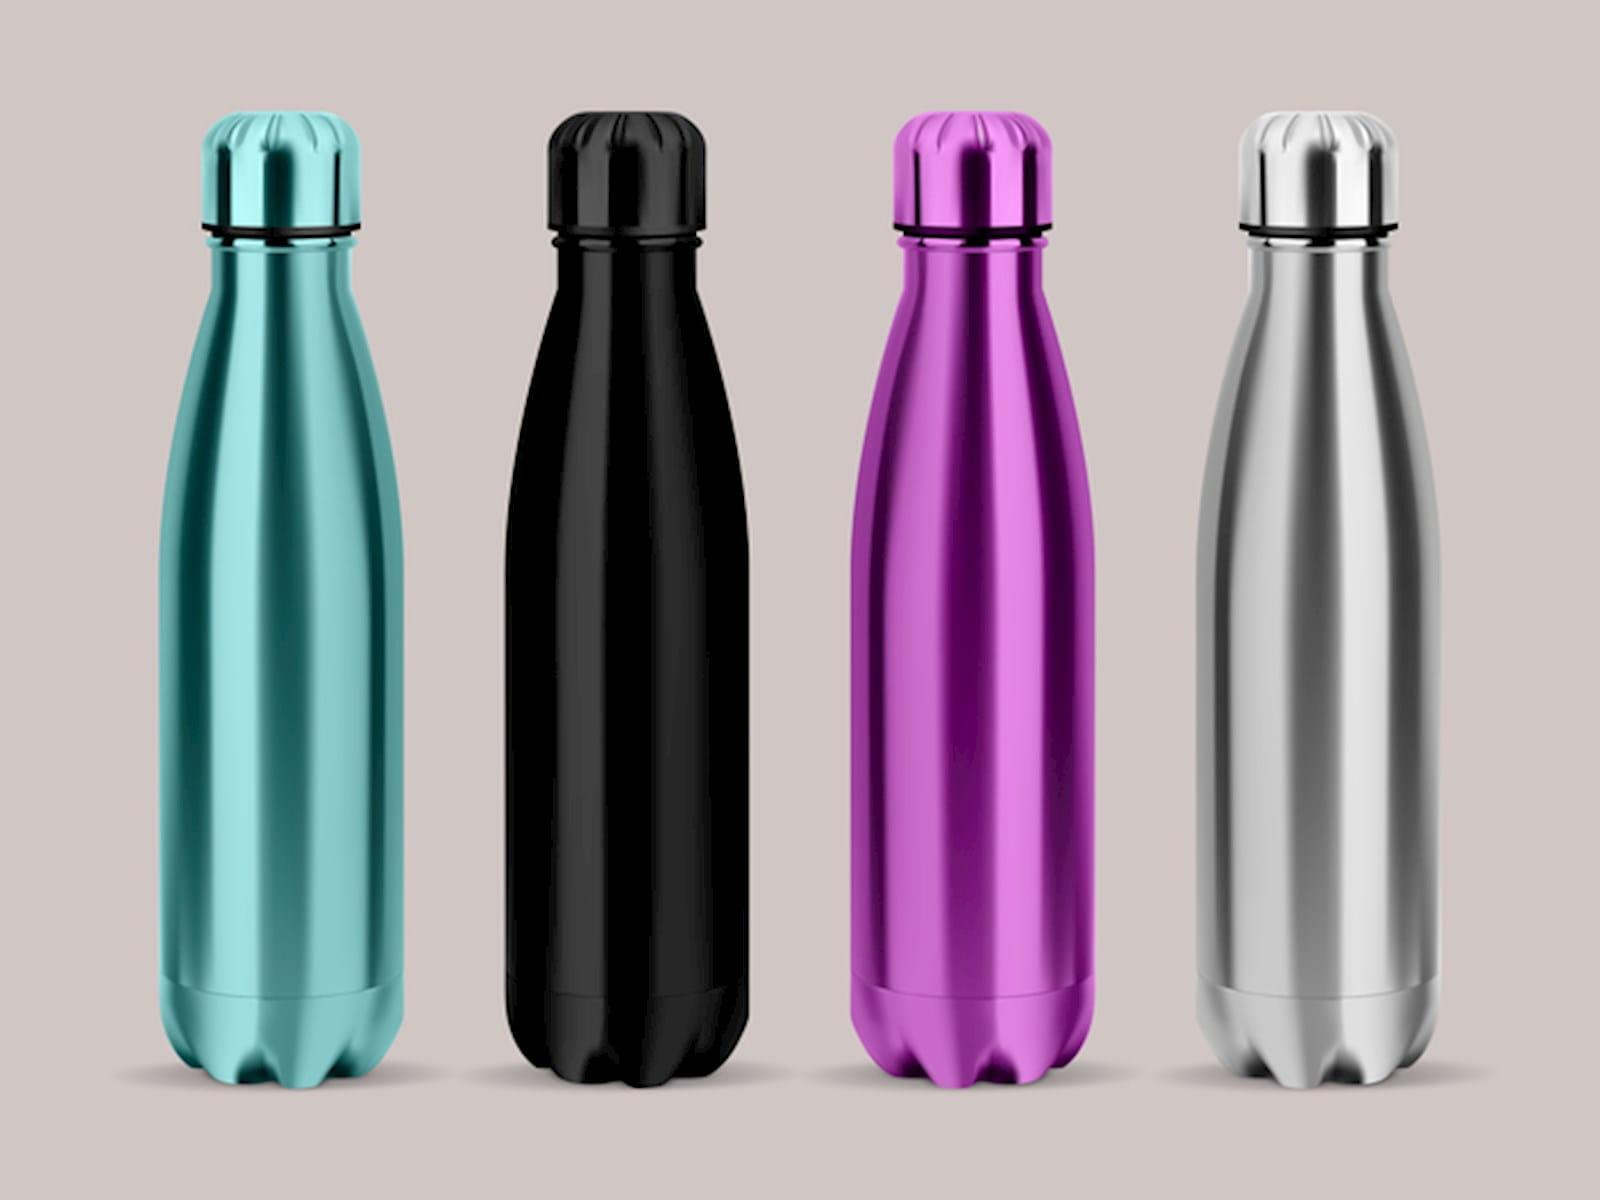 Shiny water bottles